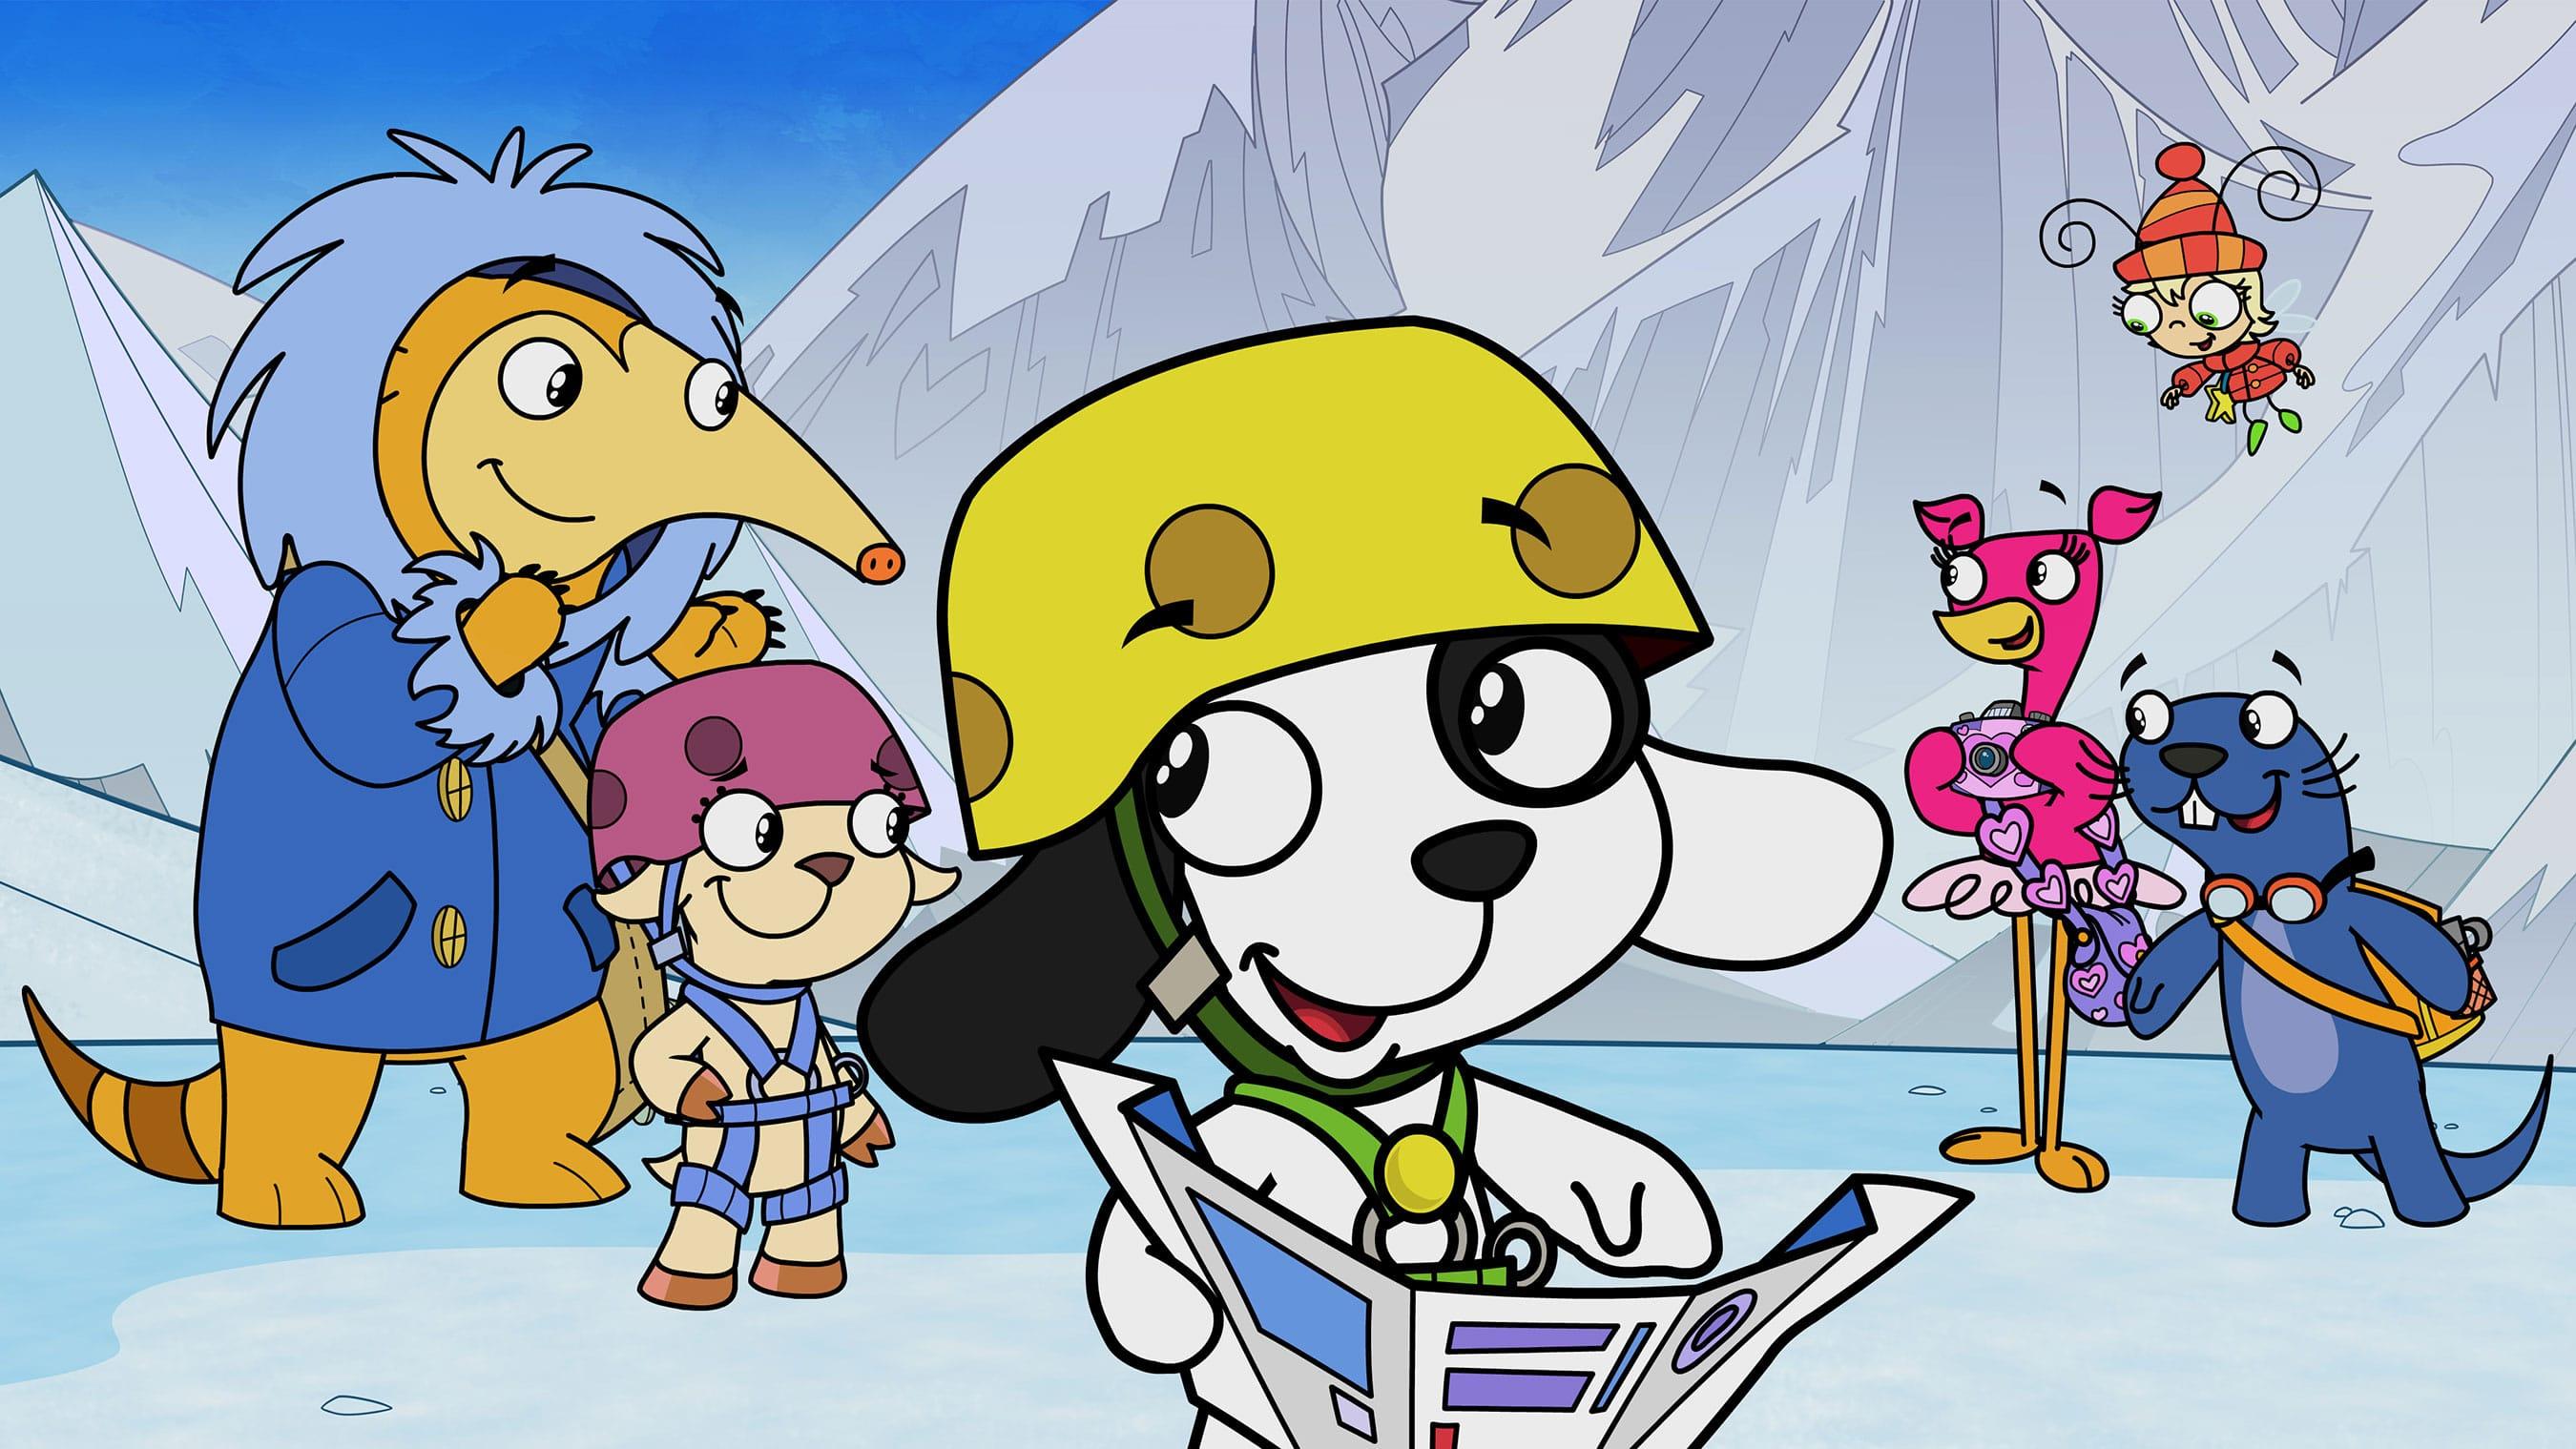 essay on cartoon network